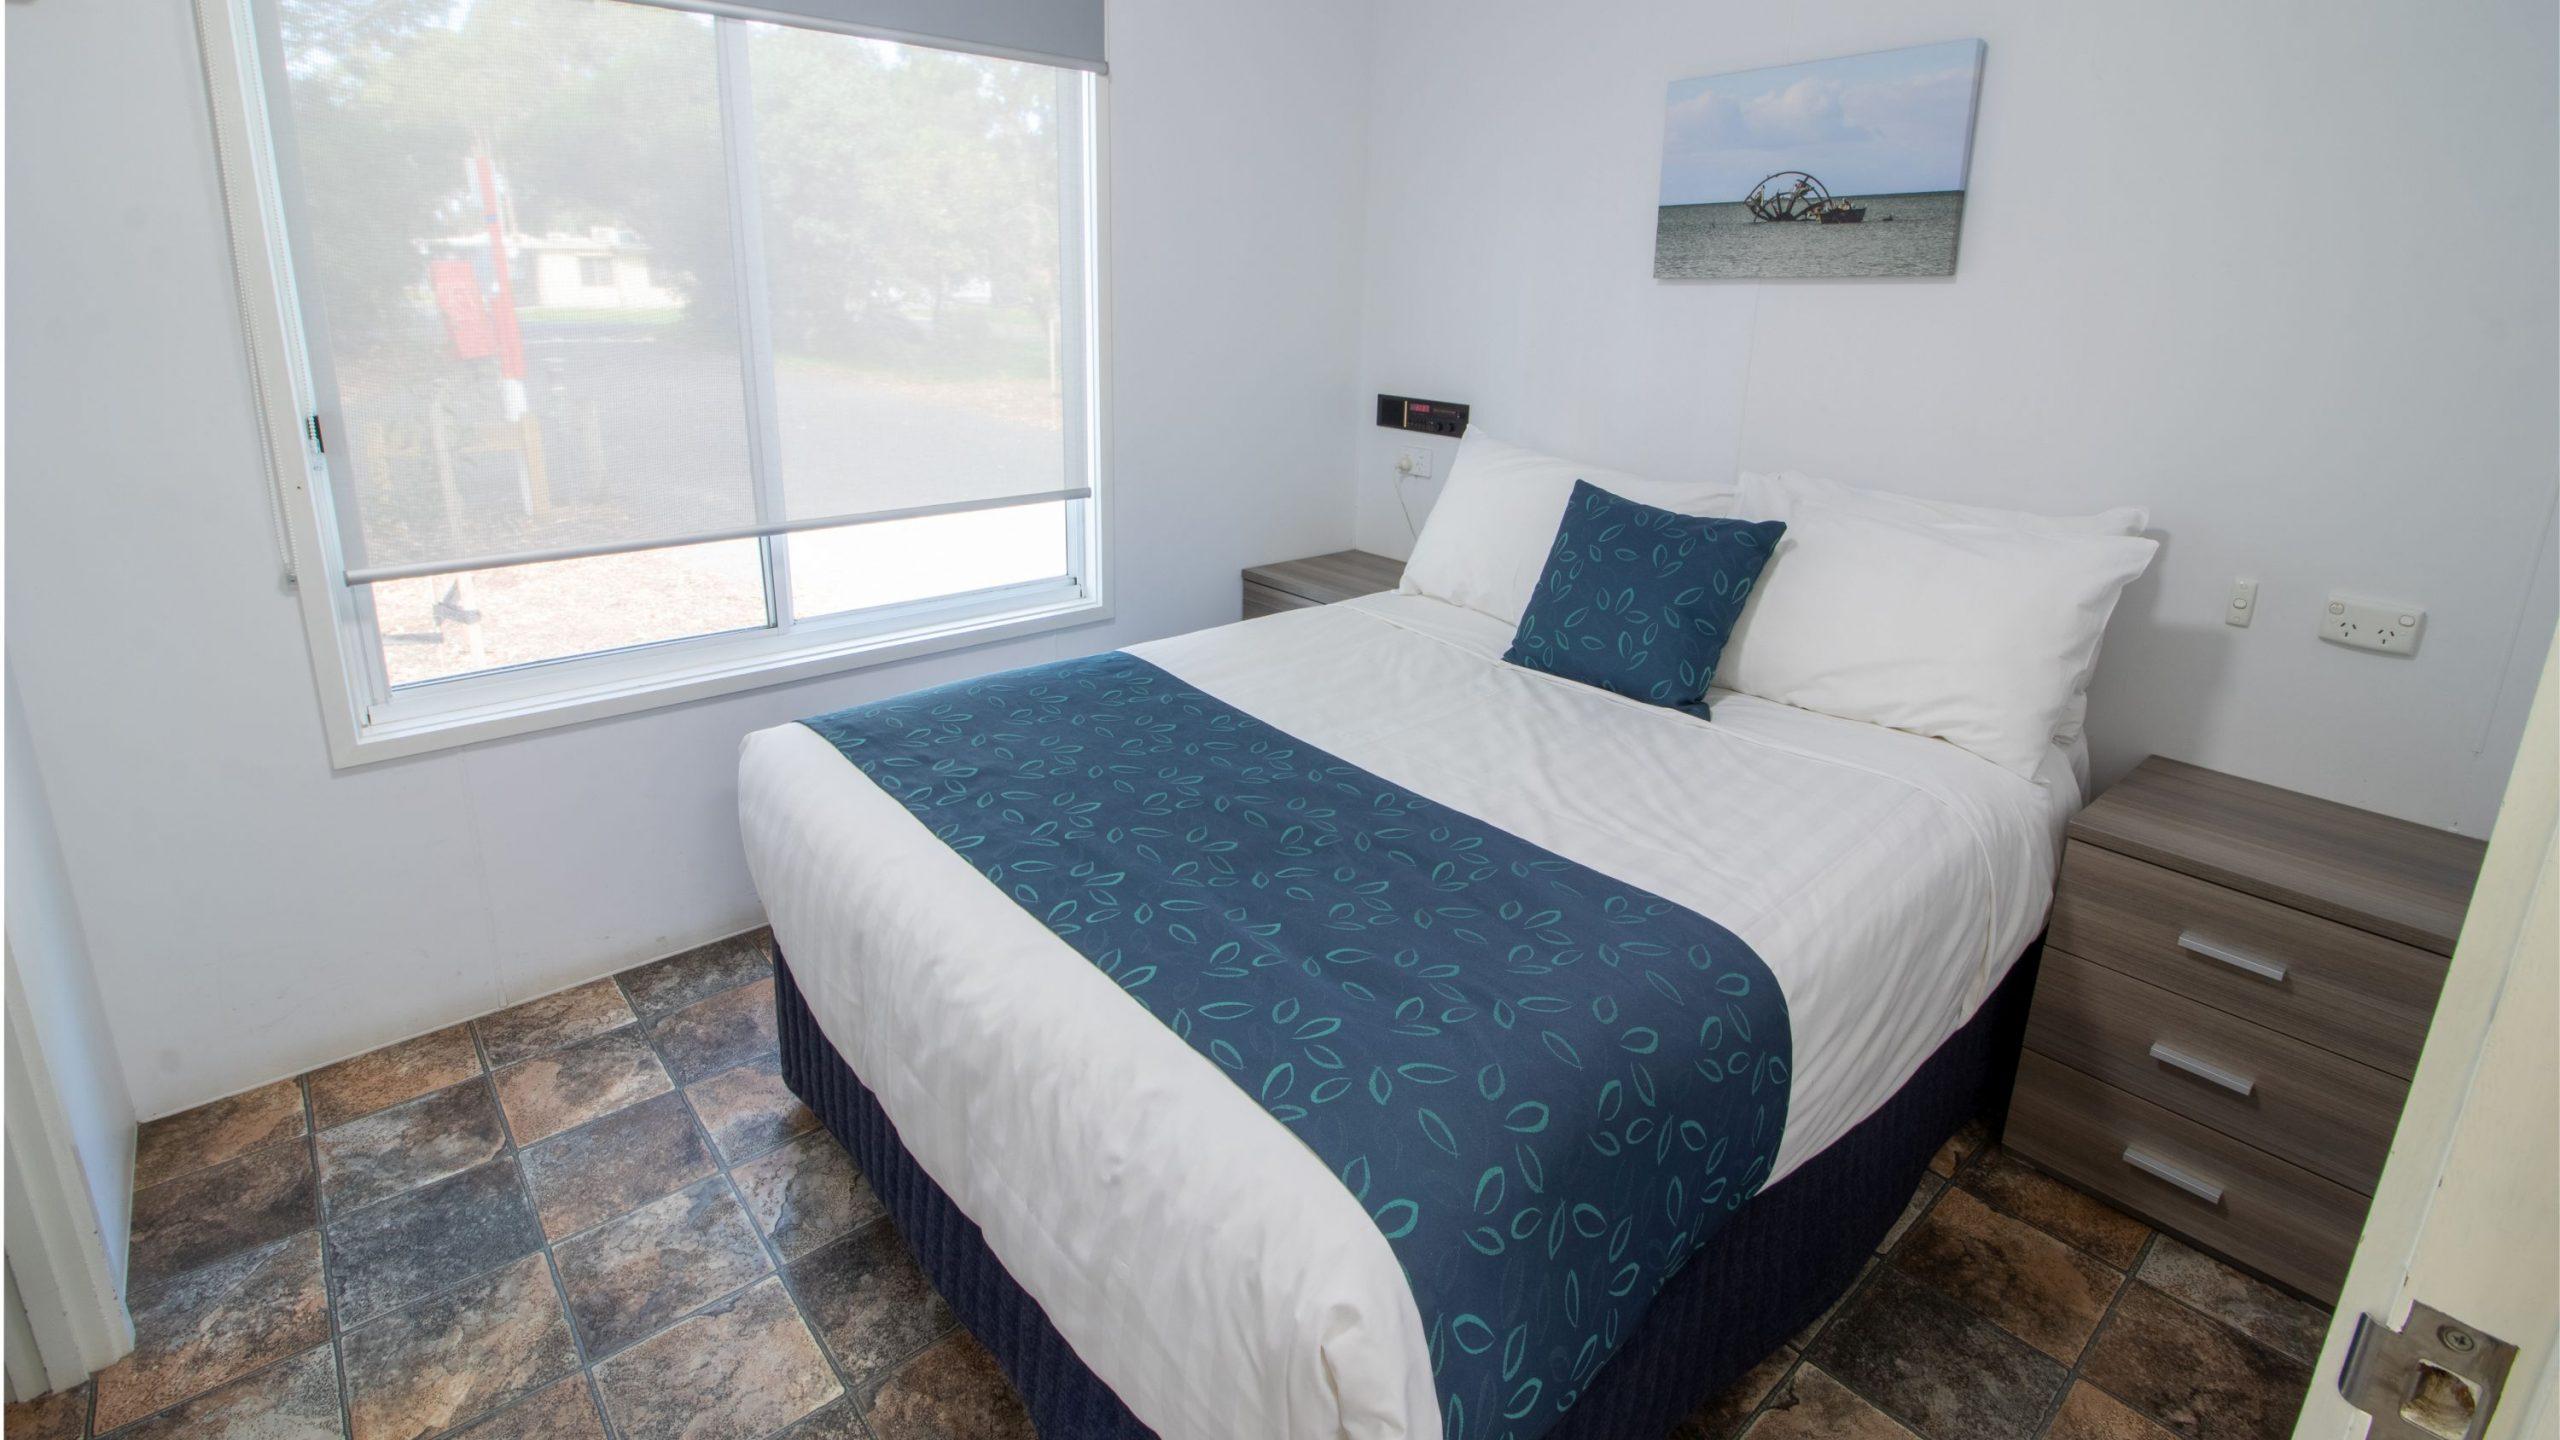 Standard Cabin master bedroom